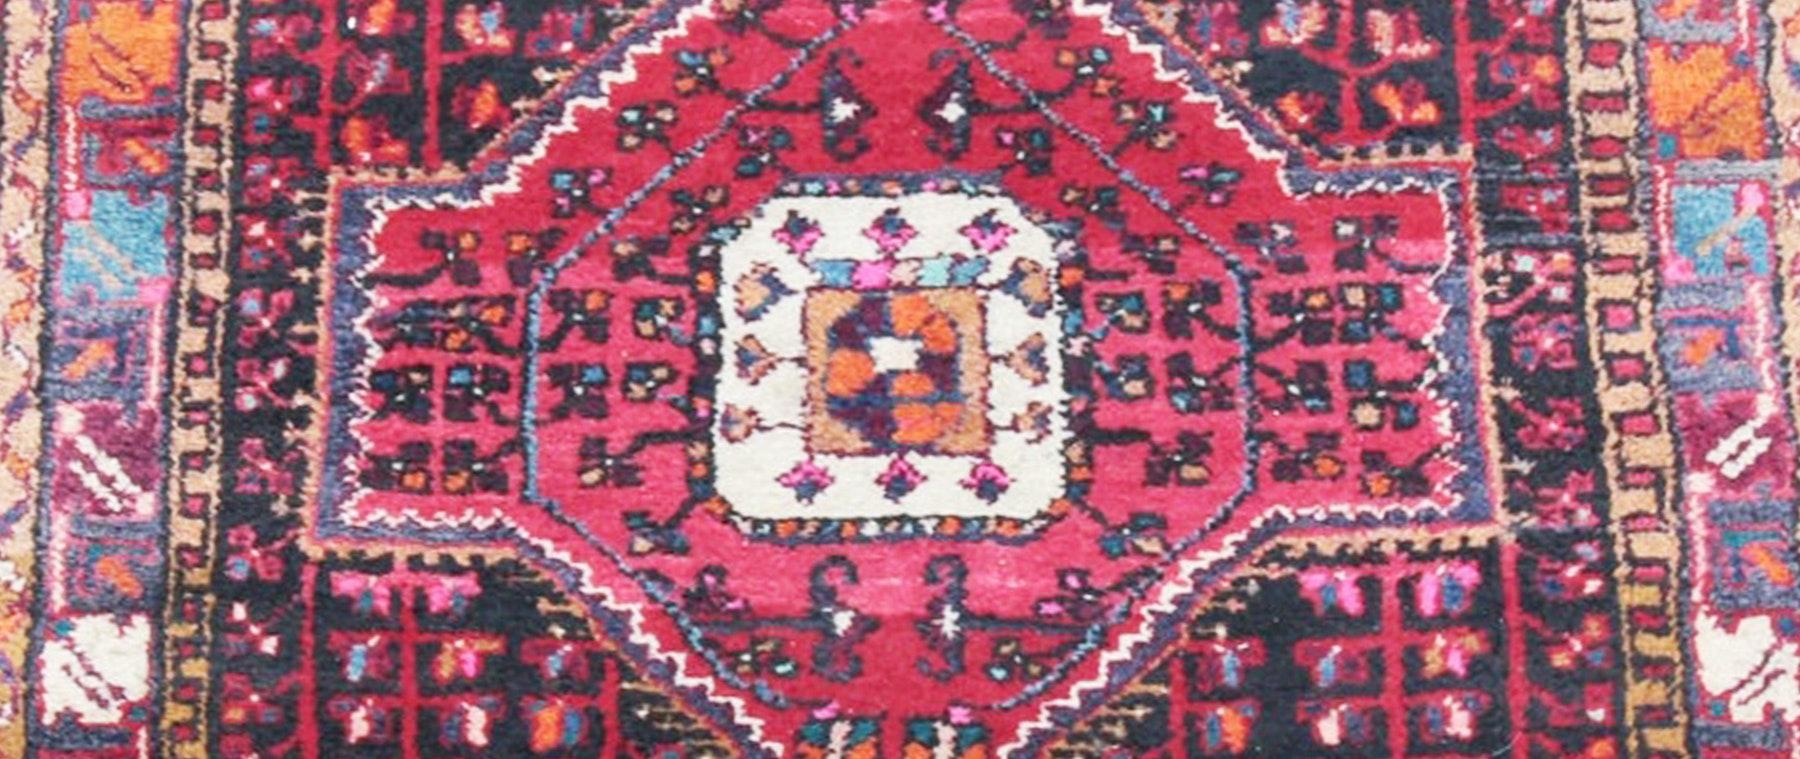 Boutique banner rug.jpg?ixlib=rb 1.1